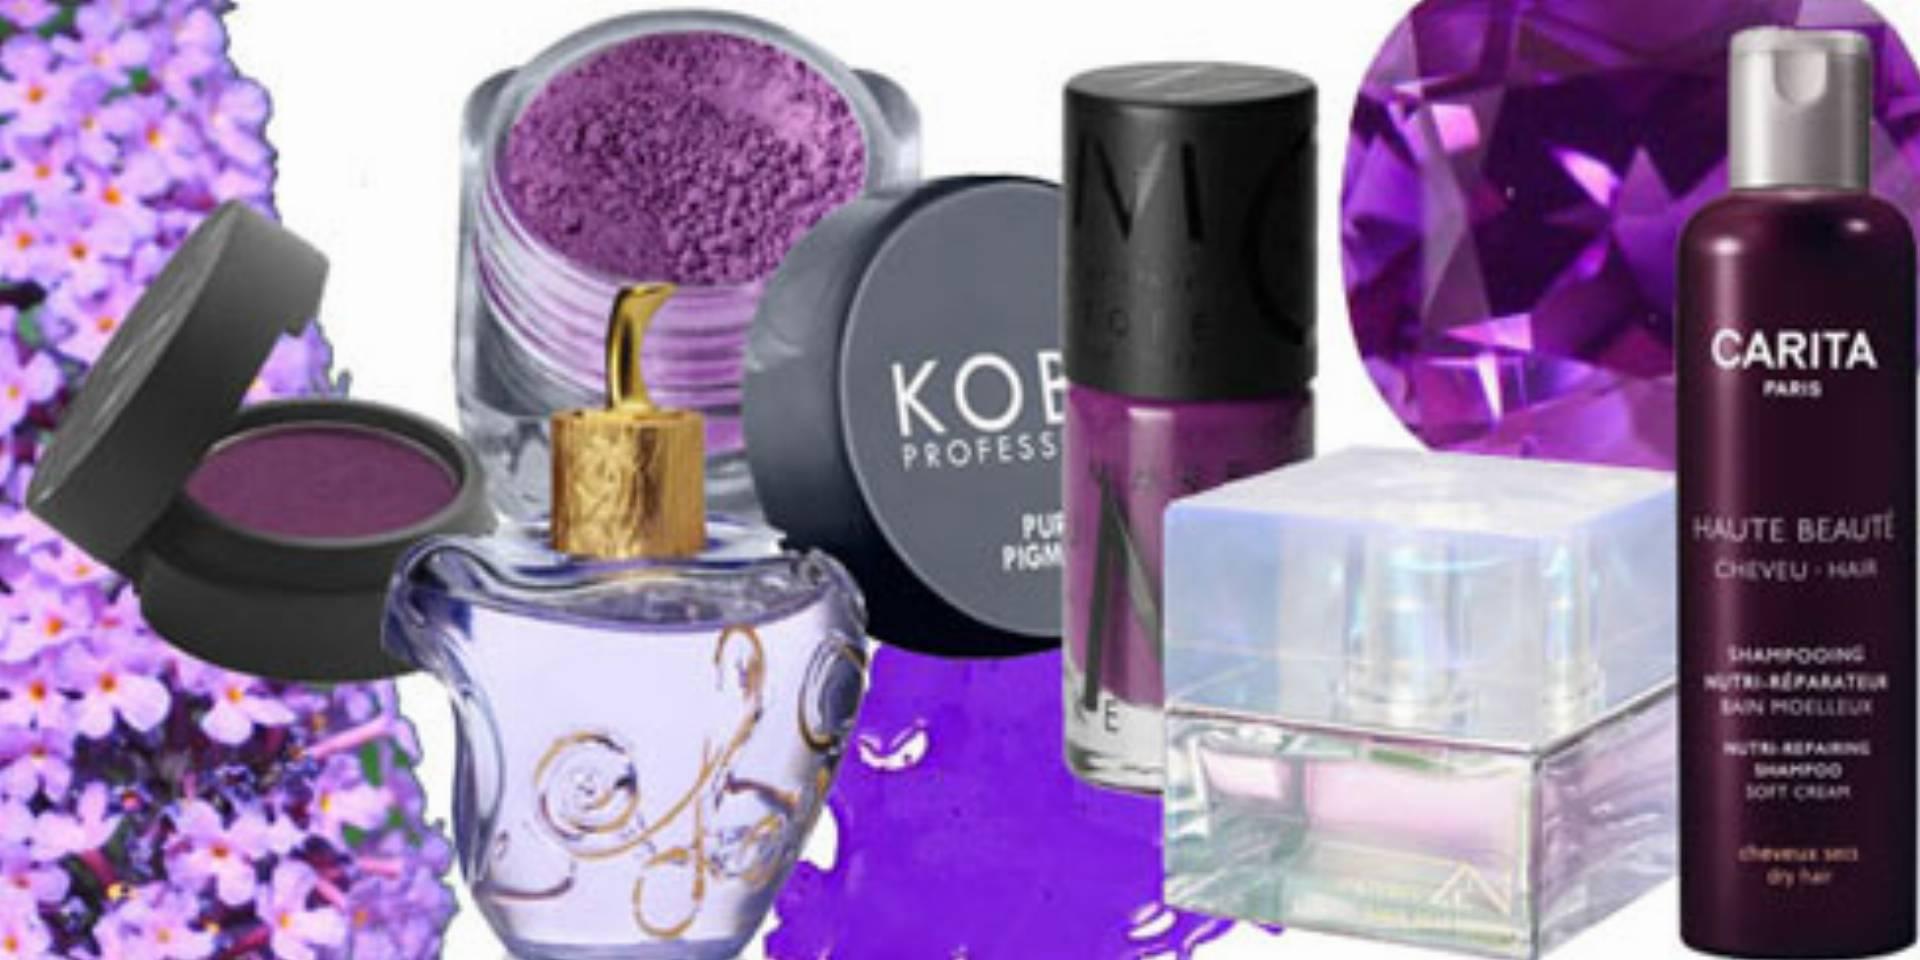 fiolety fioletowe kosmetyki